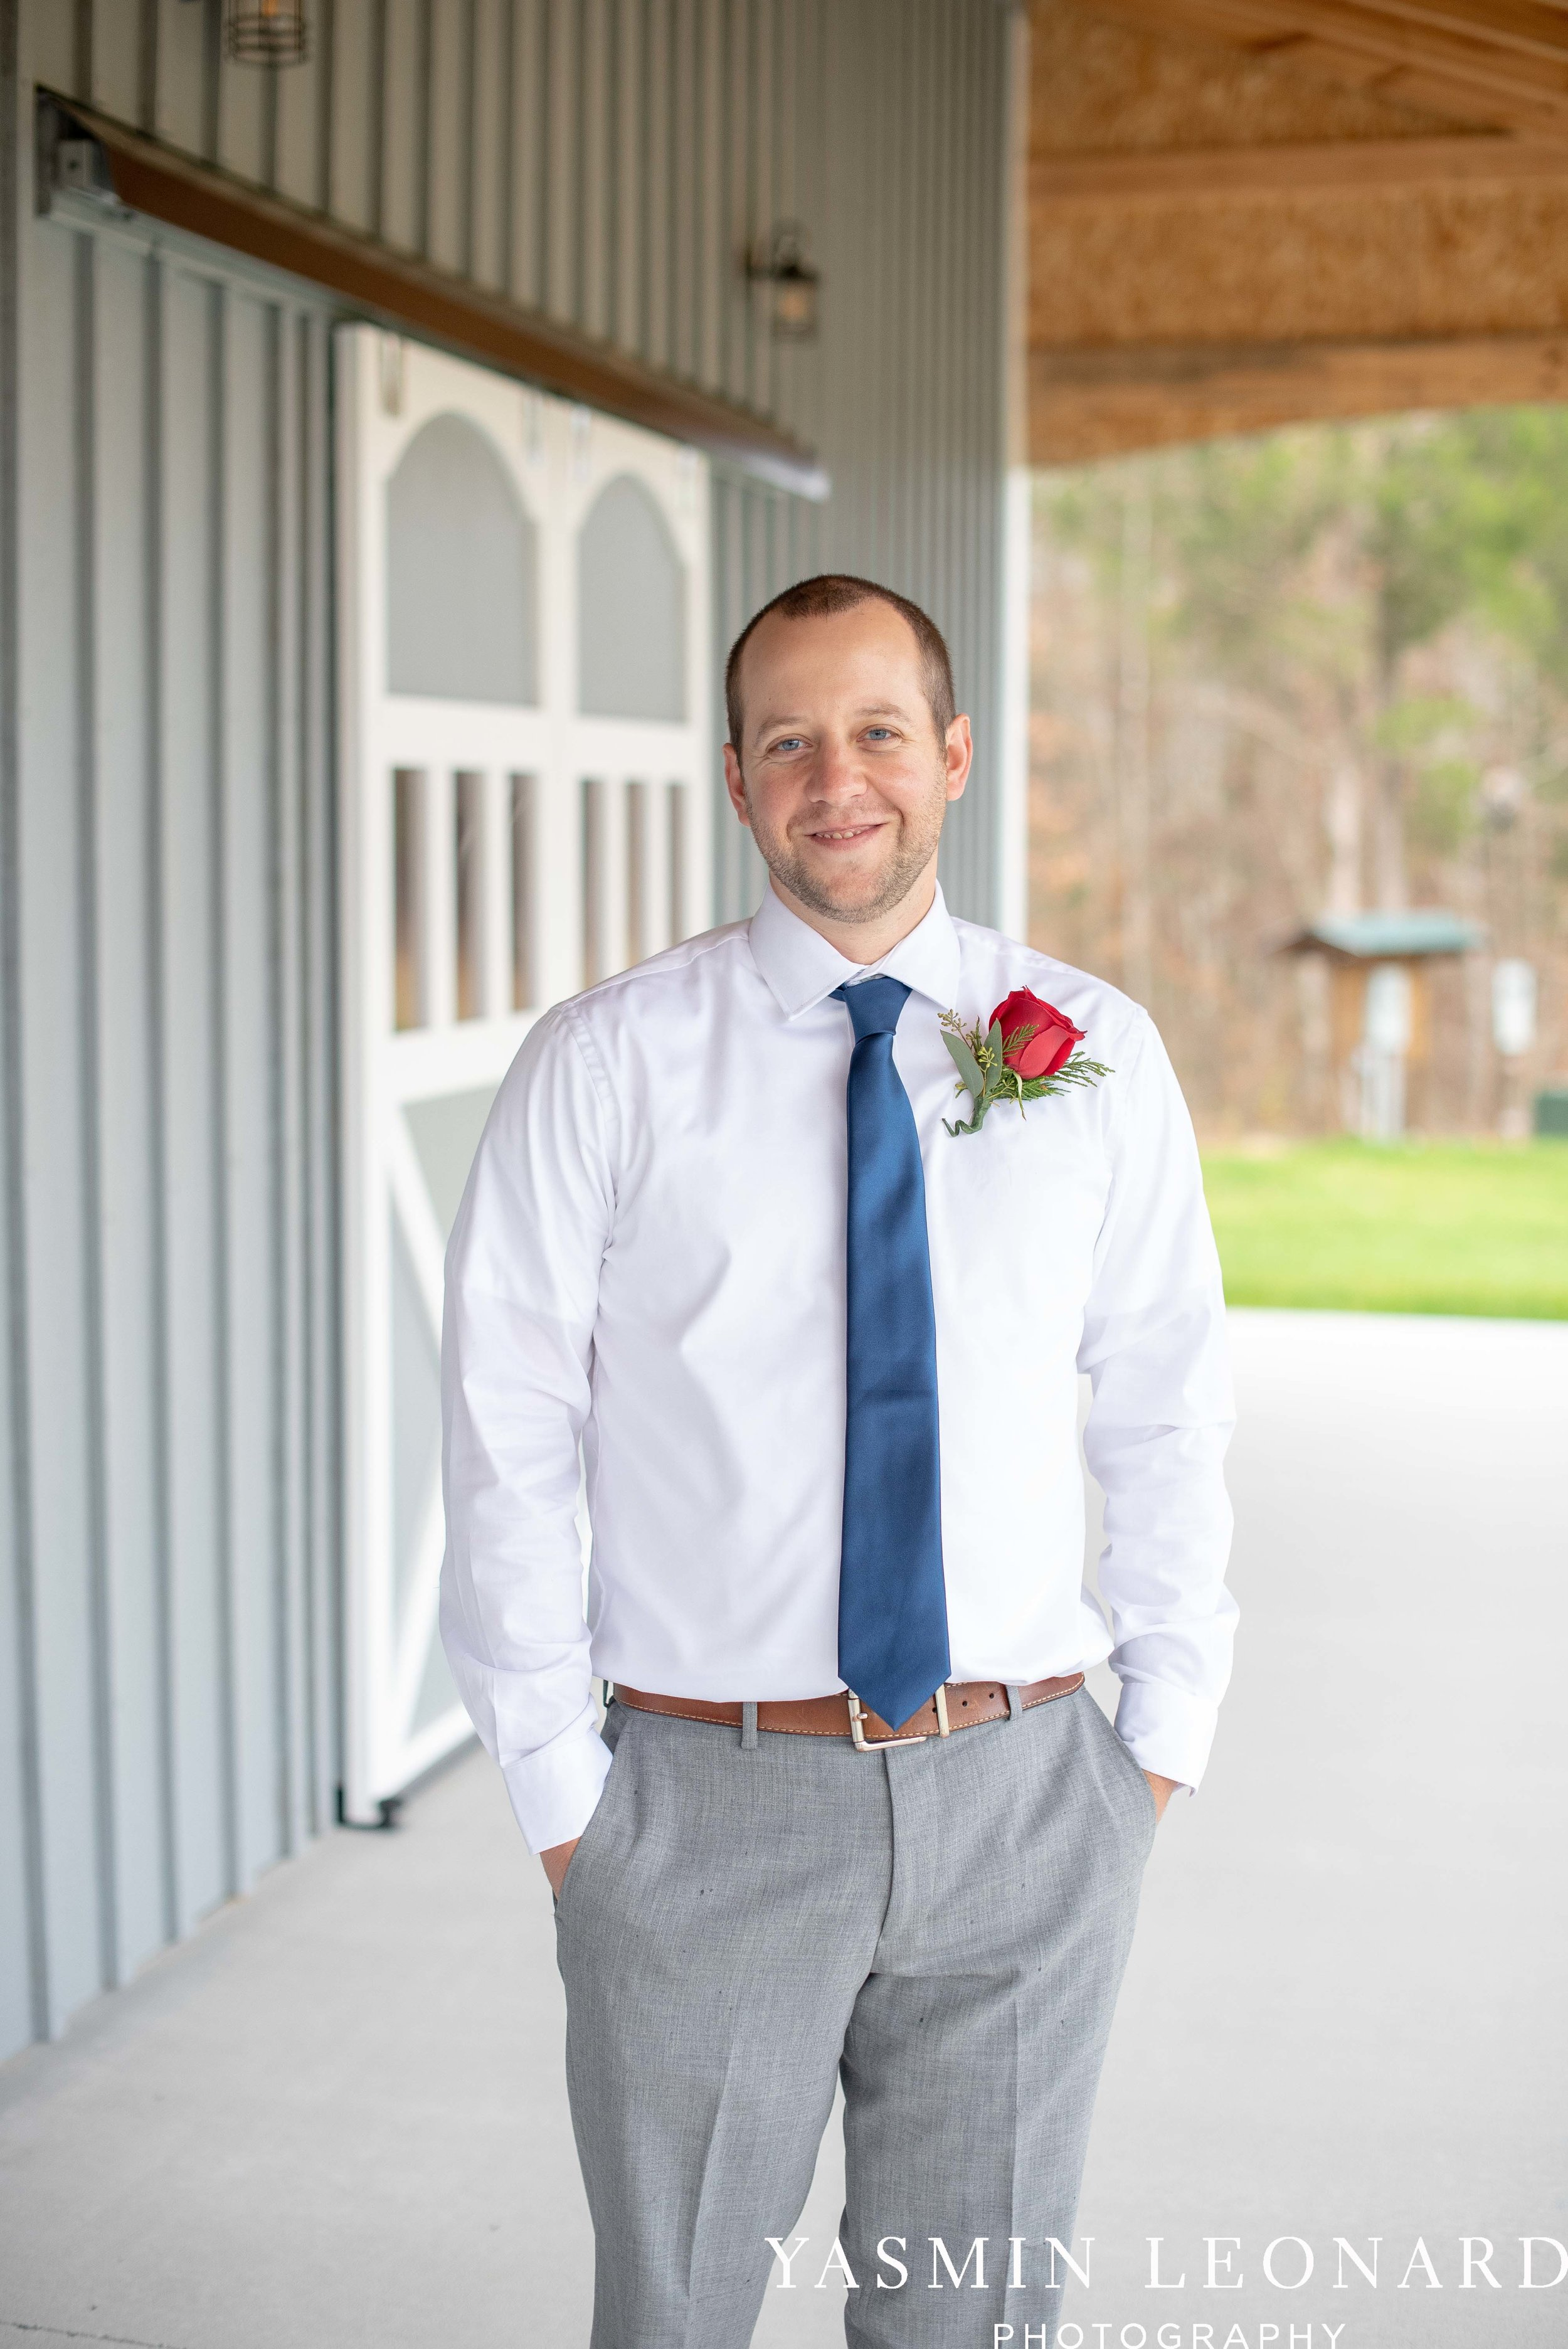 Secret Meadows at Green Dell Farm, NC Barns, NC Wedding Venues, Triad, NC, NC Wedding Photography, Triad Wedding Venues, Affordable Wedding Venues, NEW Wedding Venues, Christmas Weddings-10.jpg